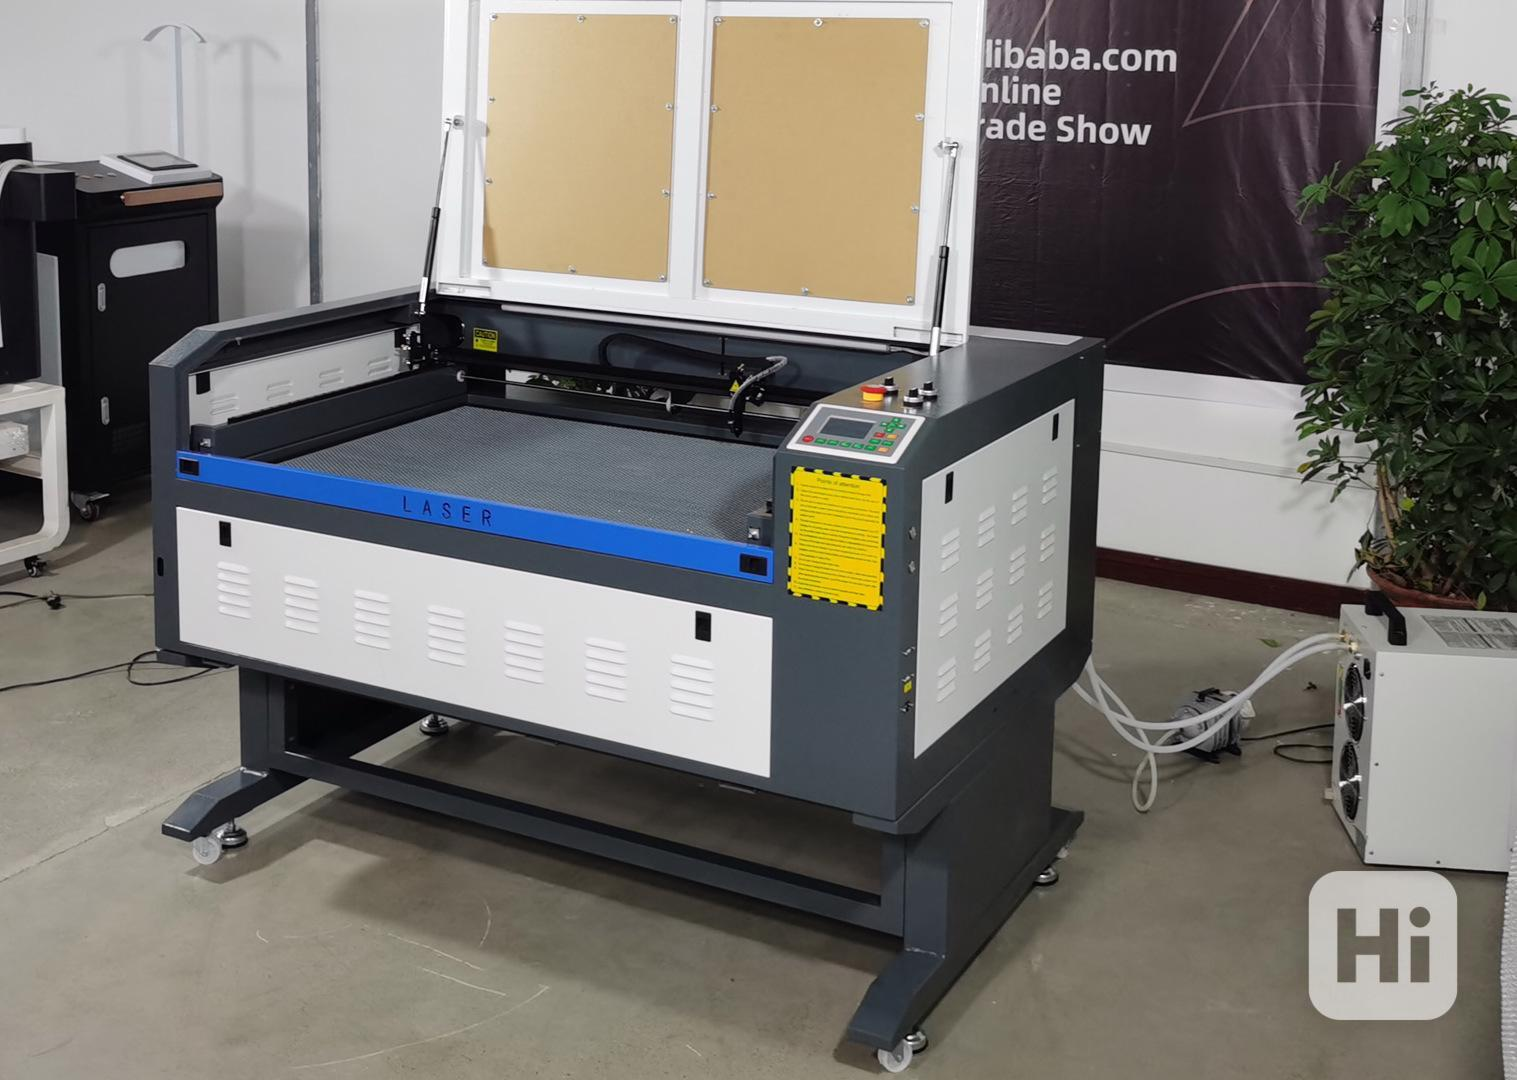 Laserová gravírka 80W, 100x60cm plocha, Ruida - foto 1